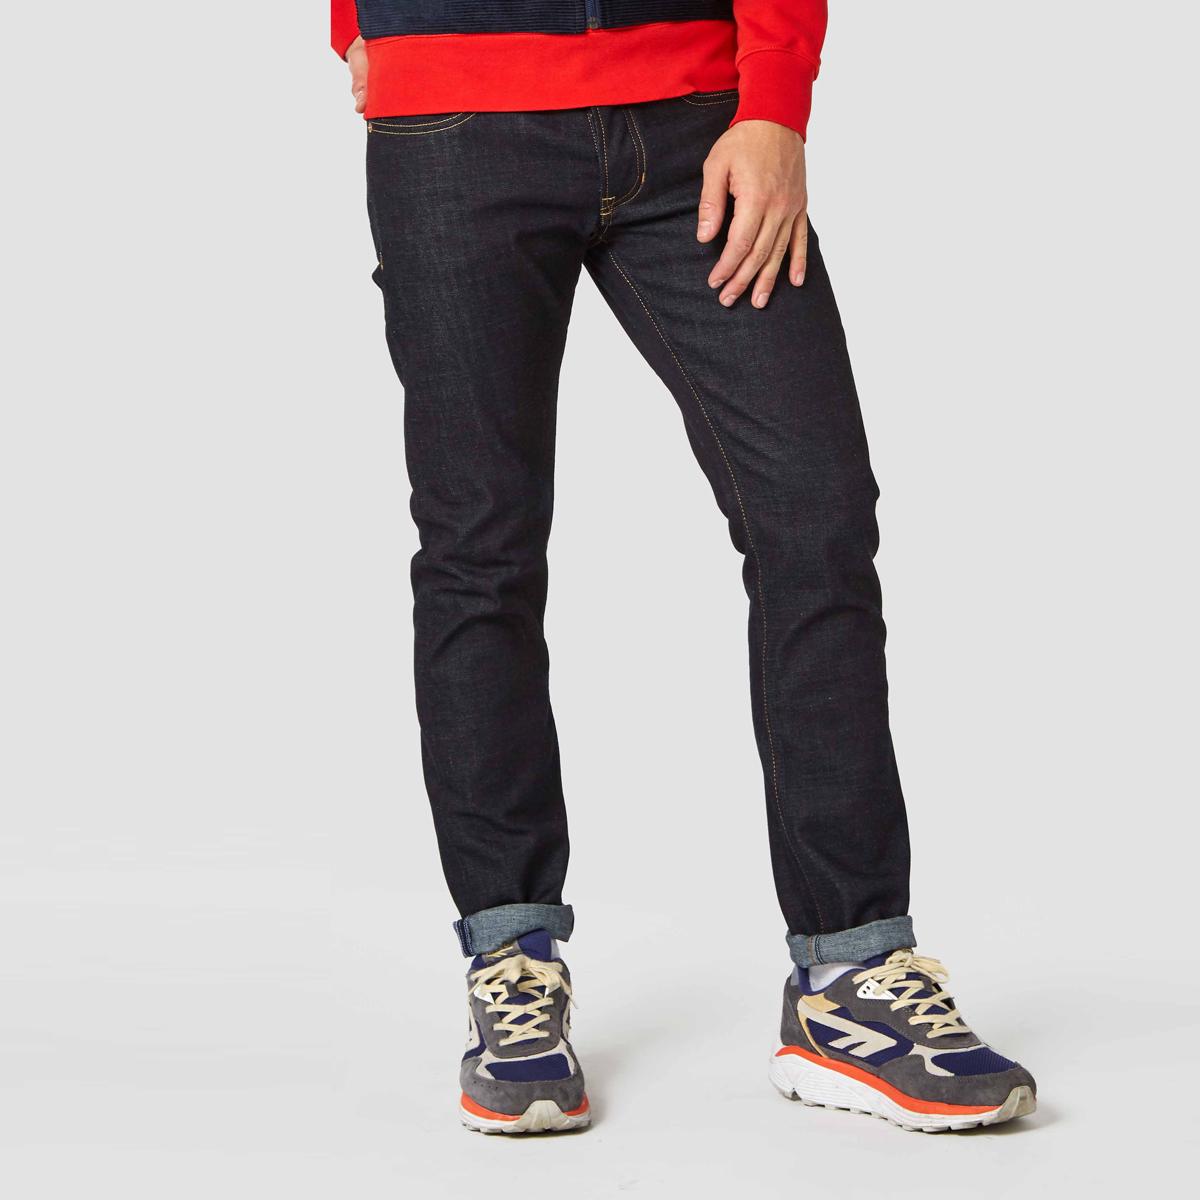 ryan dry comfort jeans koi svergie